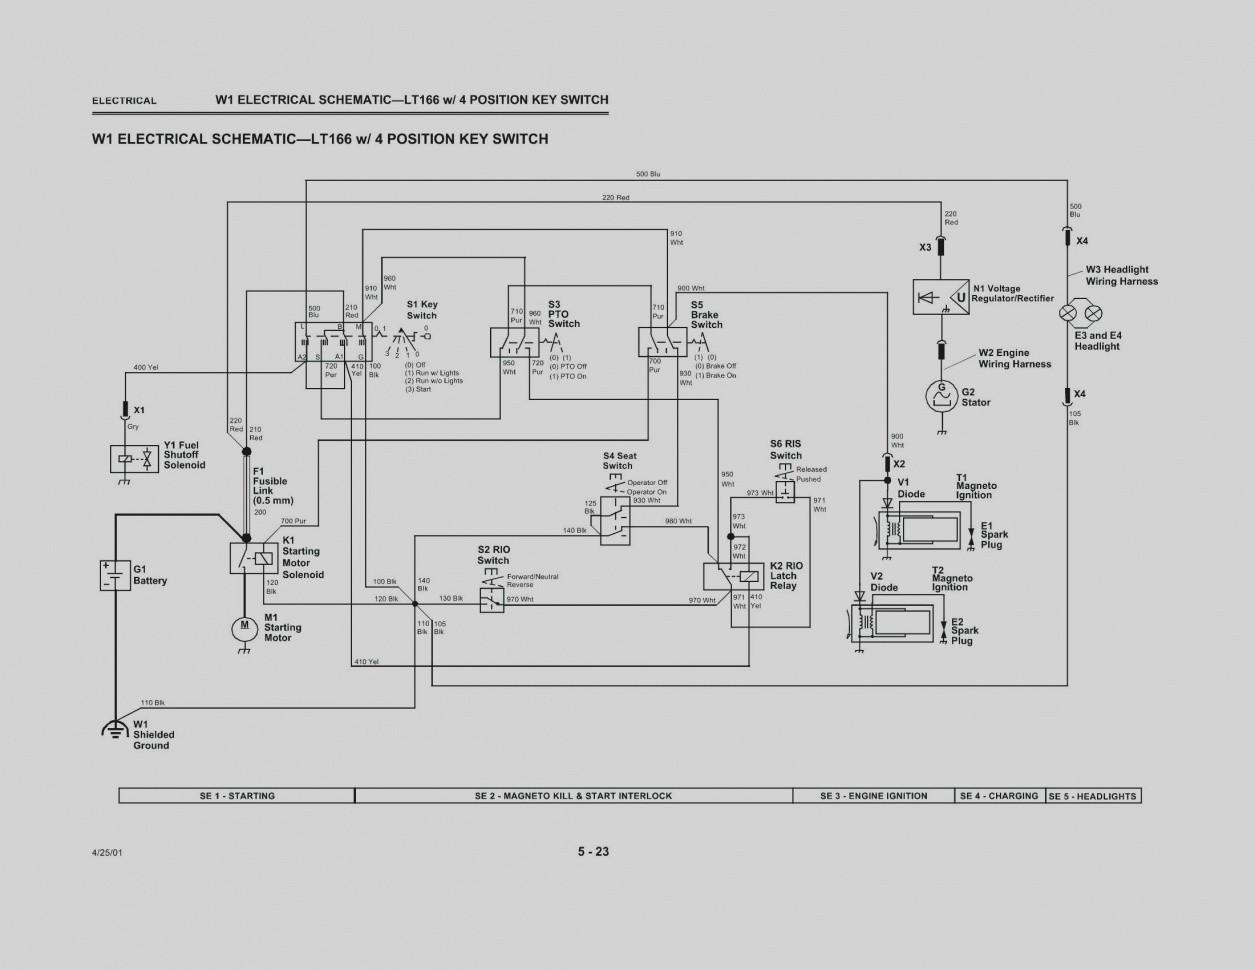 WRG-3749] Gator Cx Wiring Diagram on kawasaki mule wiring-diagram, power wheels wiring-diagram, deere gator wire schematic, jd gator wiring-diagram, deere gator wiring harness,